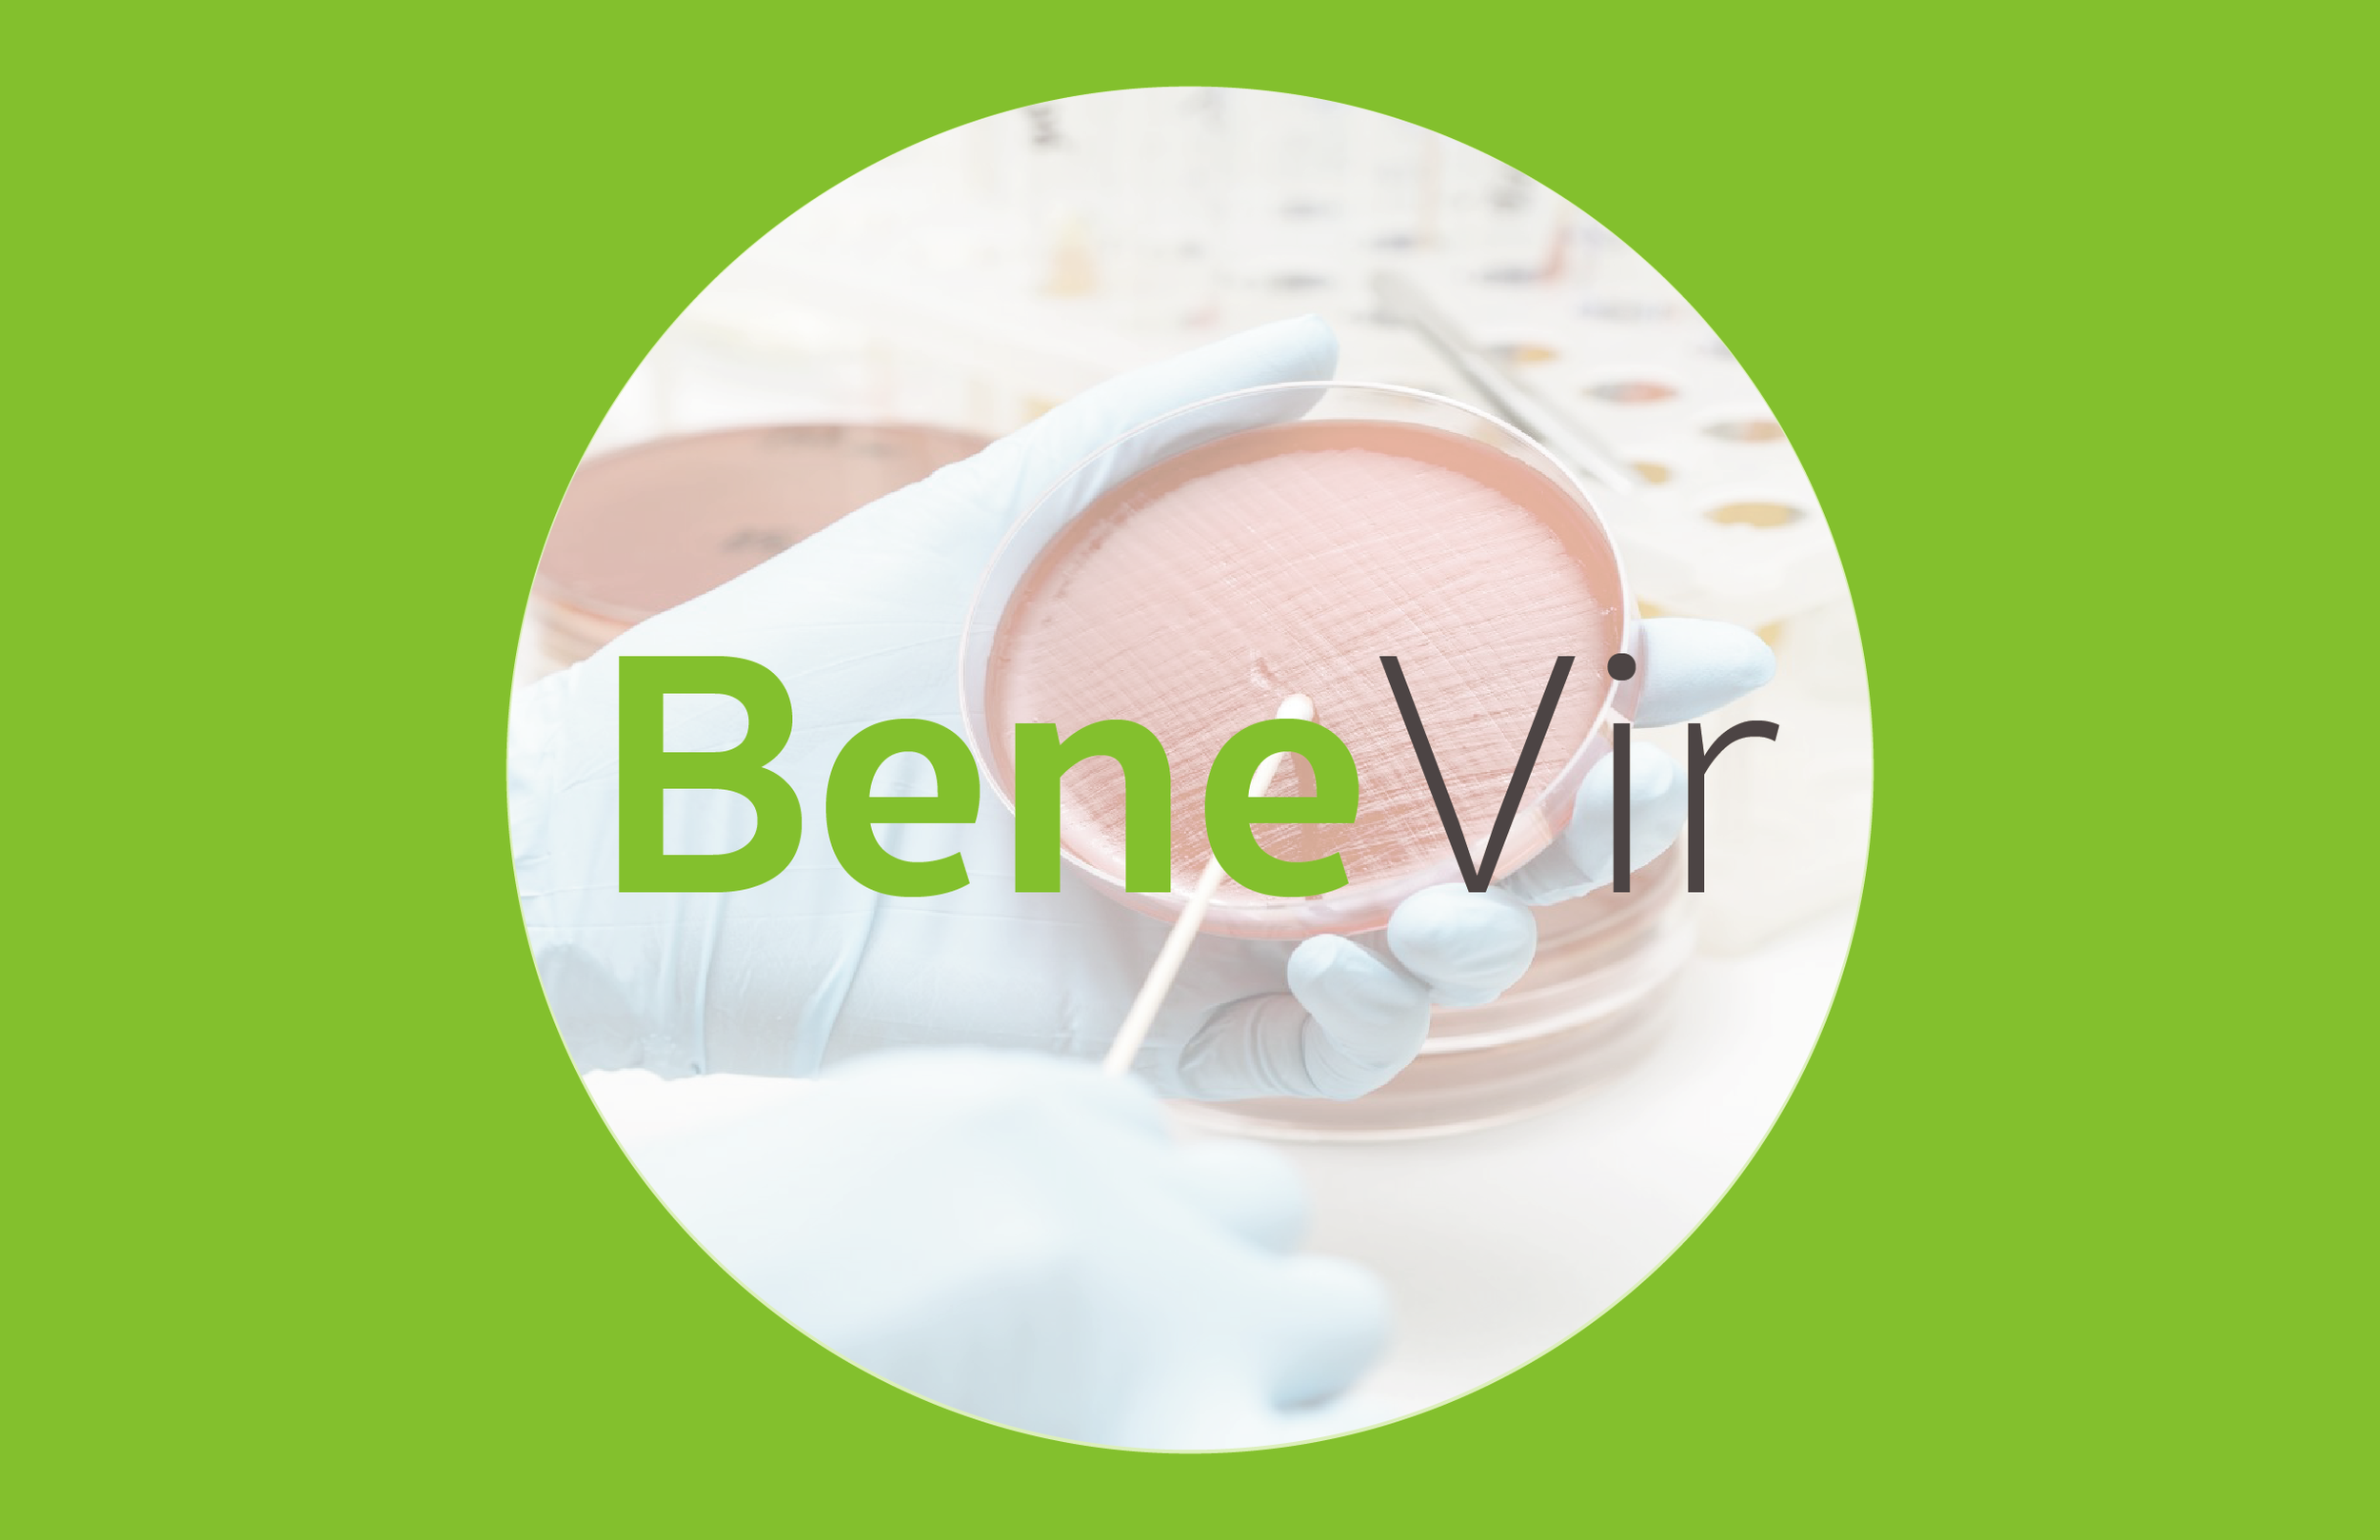 Benevir logos new 2-01.png